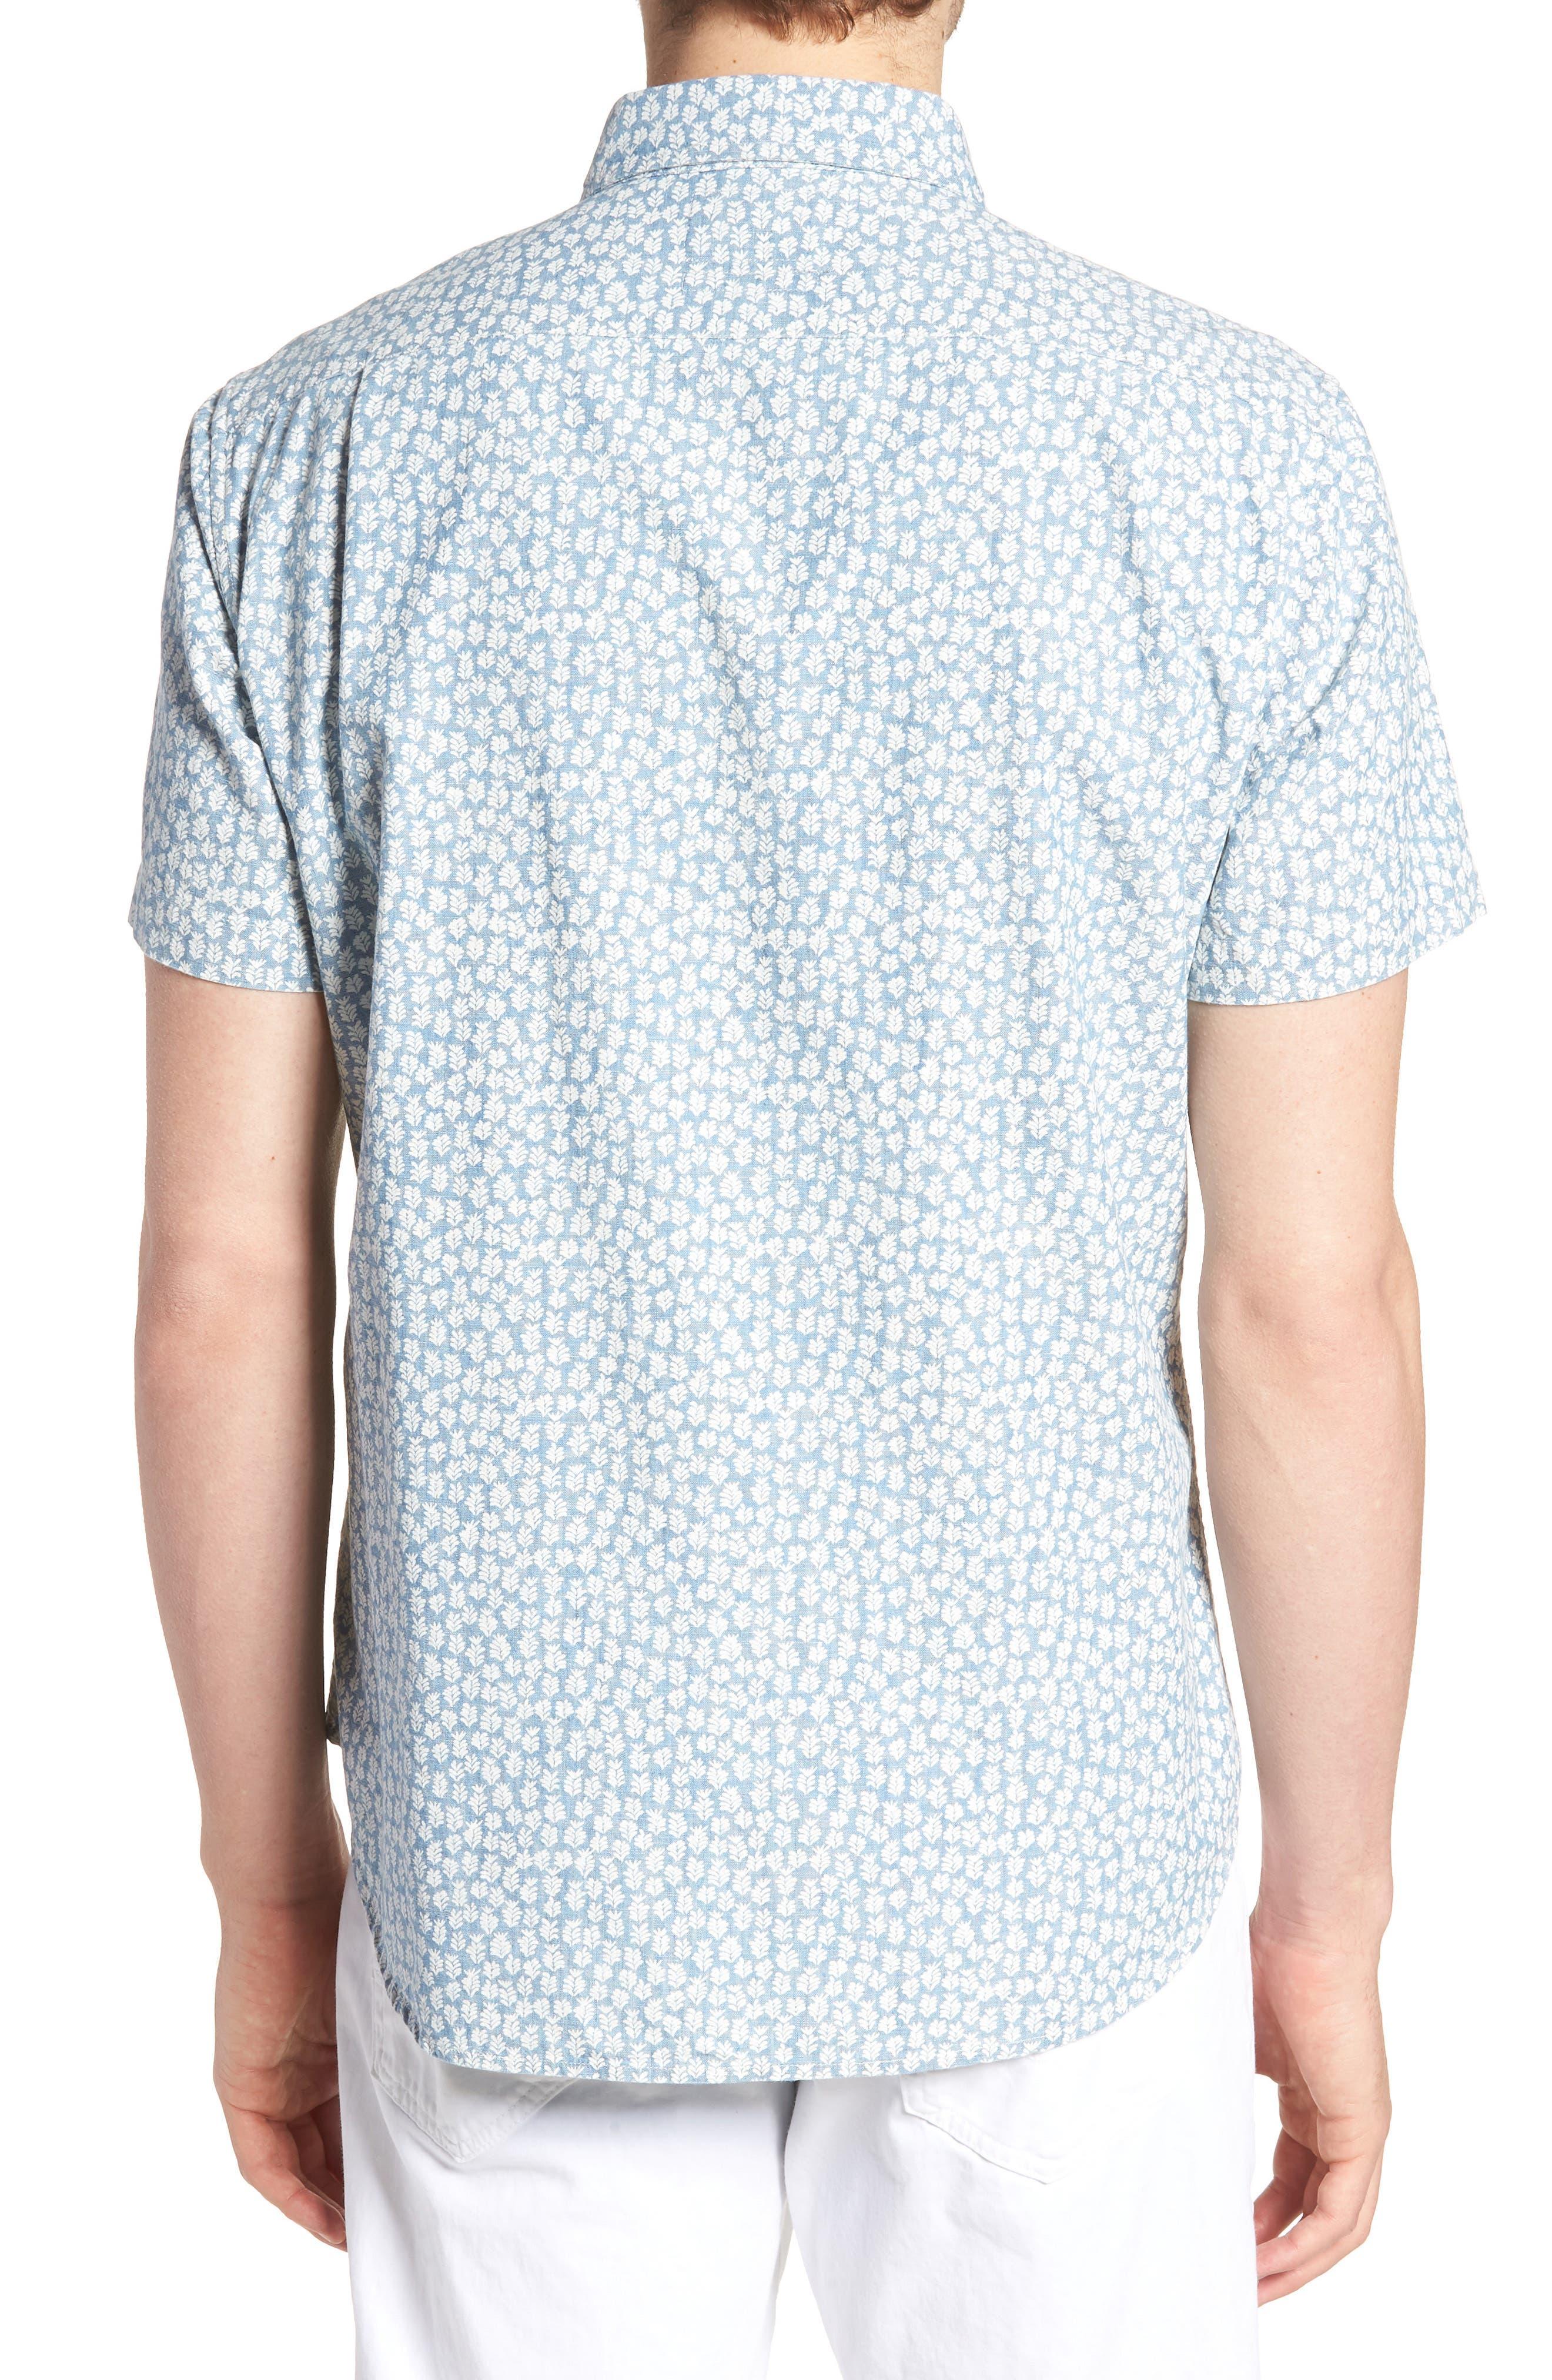 BONOBOS,                             Riviera Slim Fit Leaf Print Sport Shirt,                             Alternate thumbnail 2, color,                             400